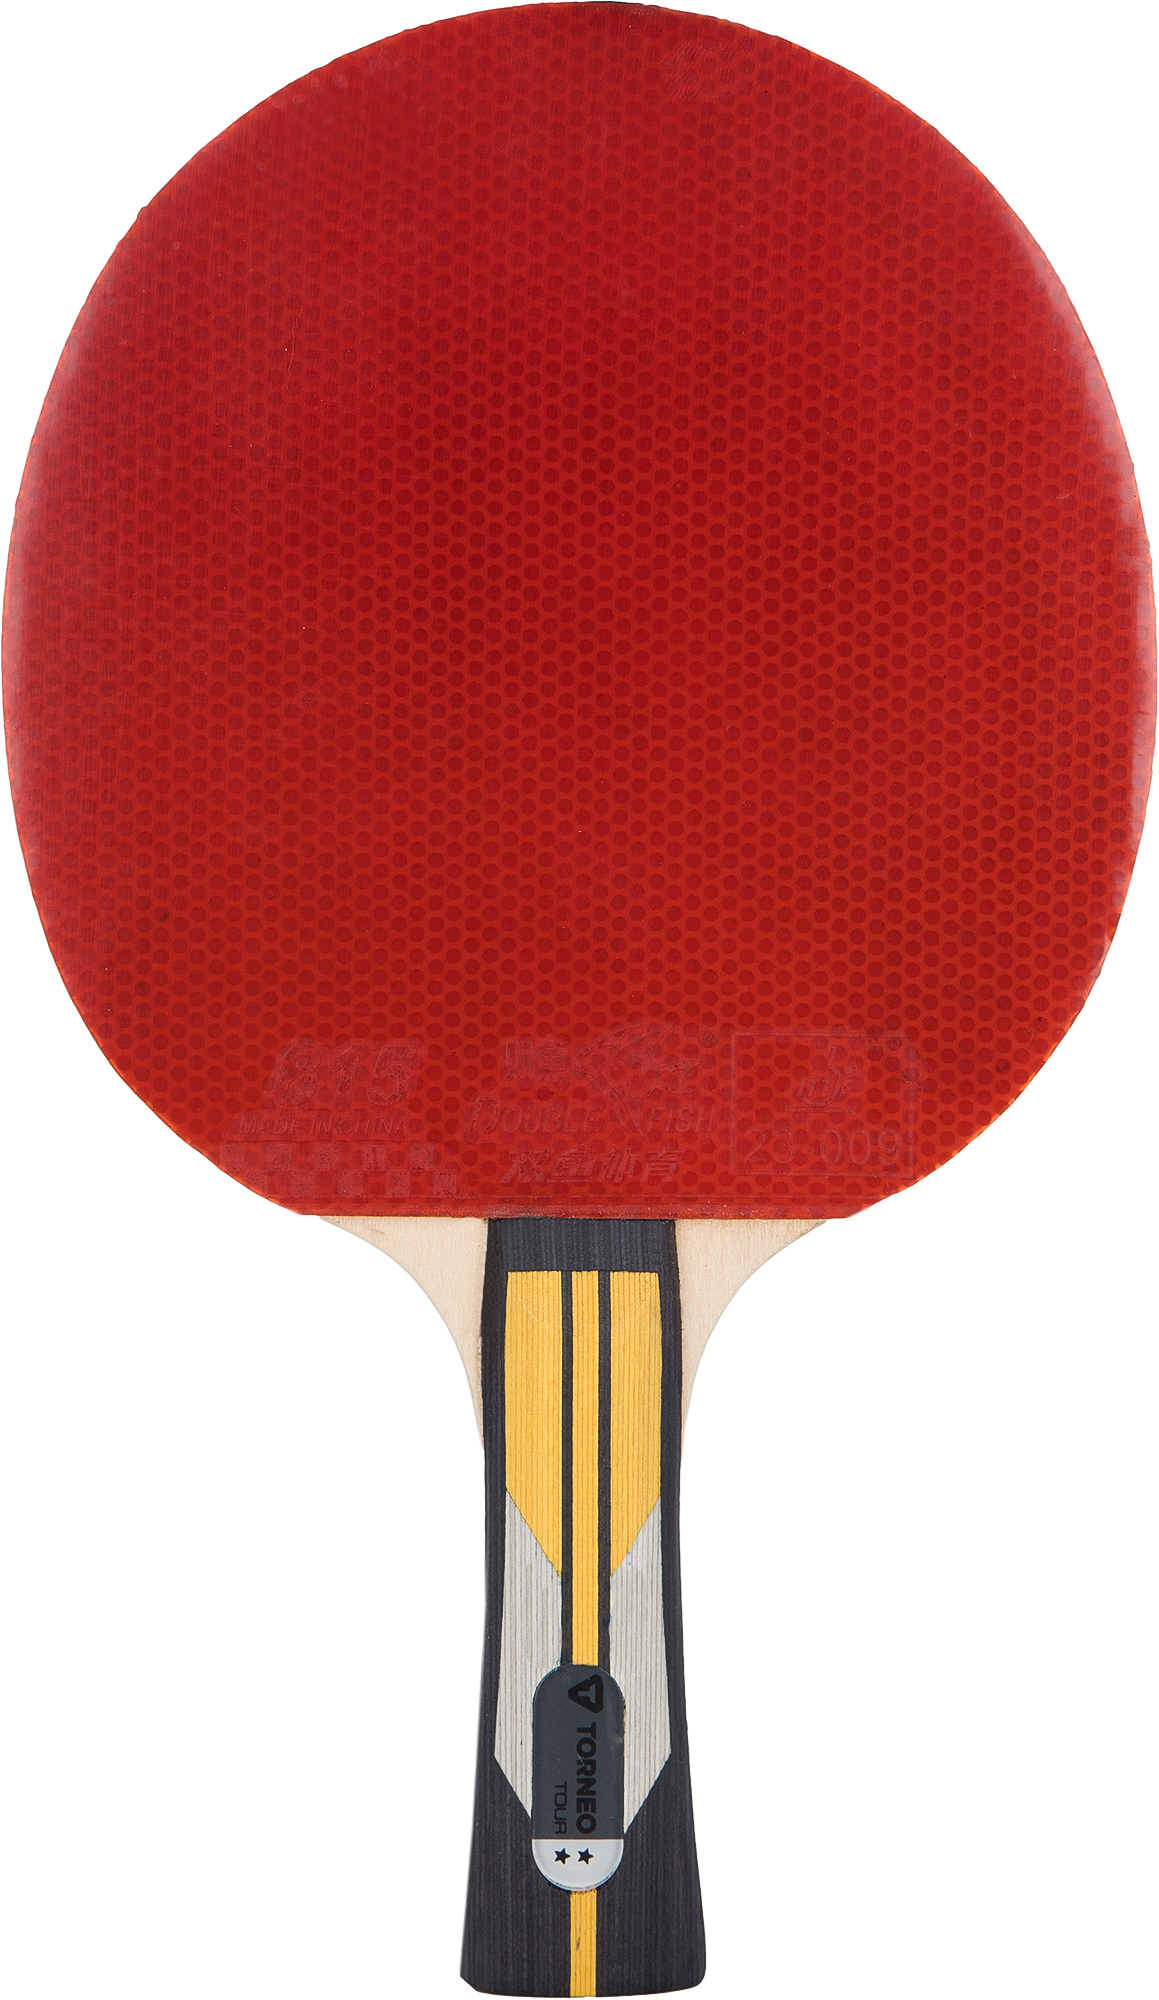 Torneo Ракетка для настольного тенниса Torneo Tour цена